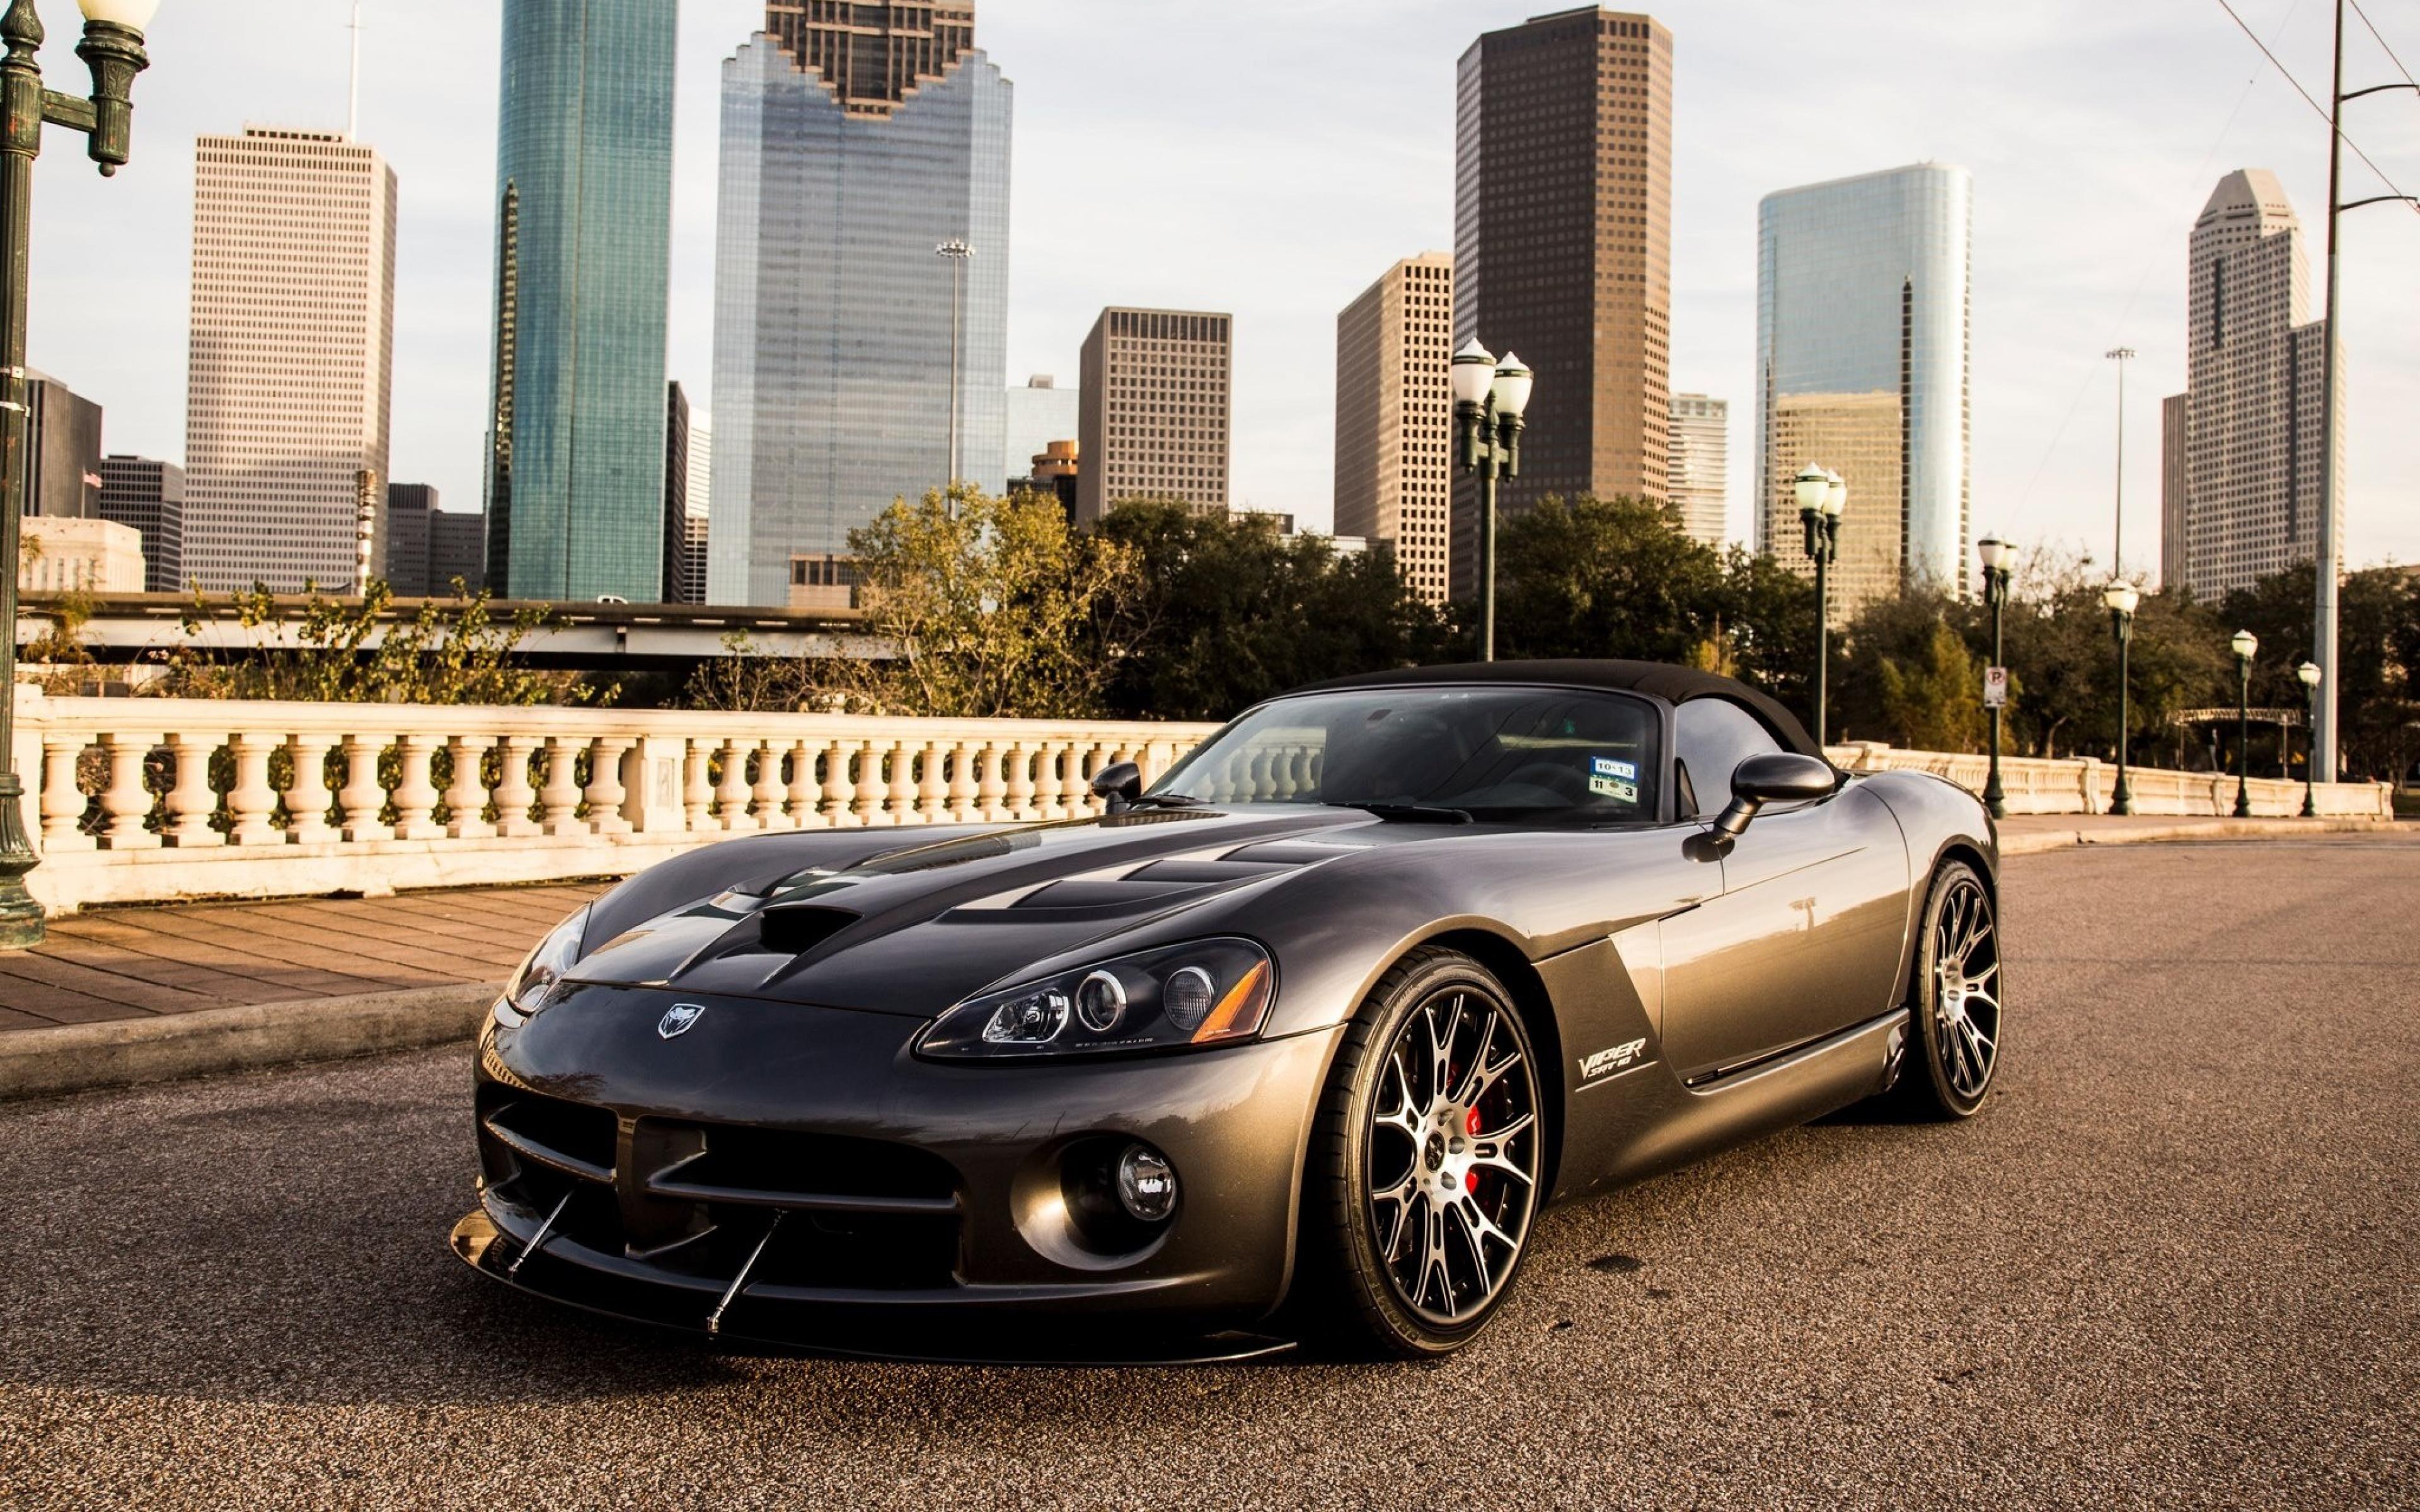 86 dodge viper hd wallpapers background images - Dodge car 4k wallpaper ...